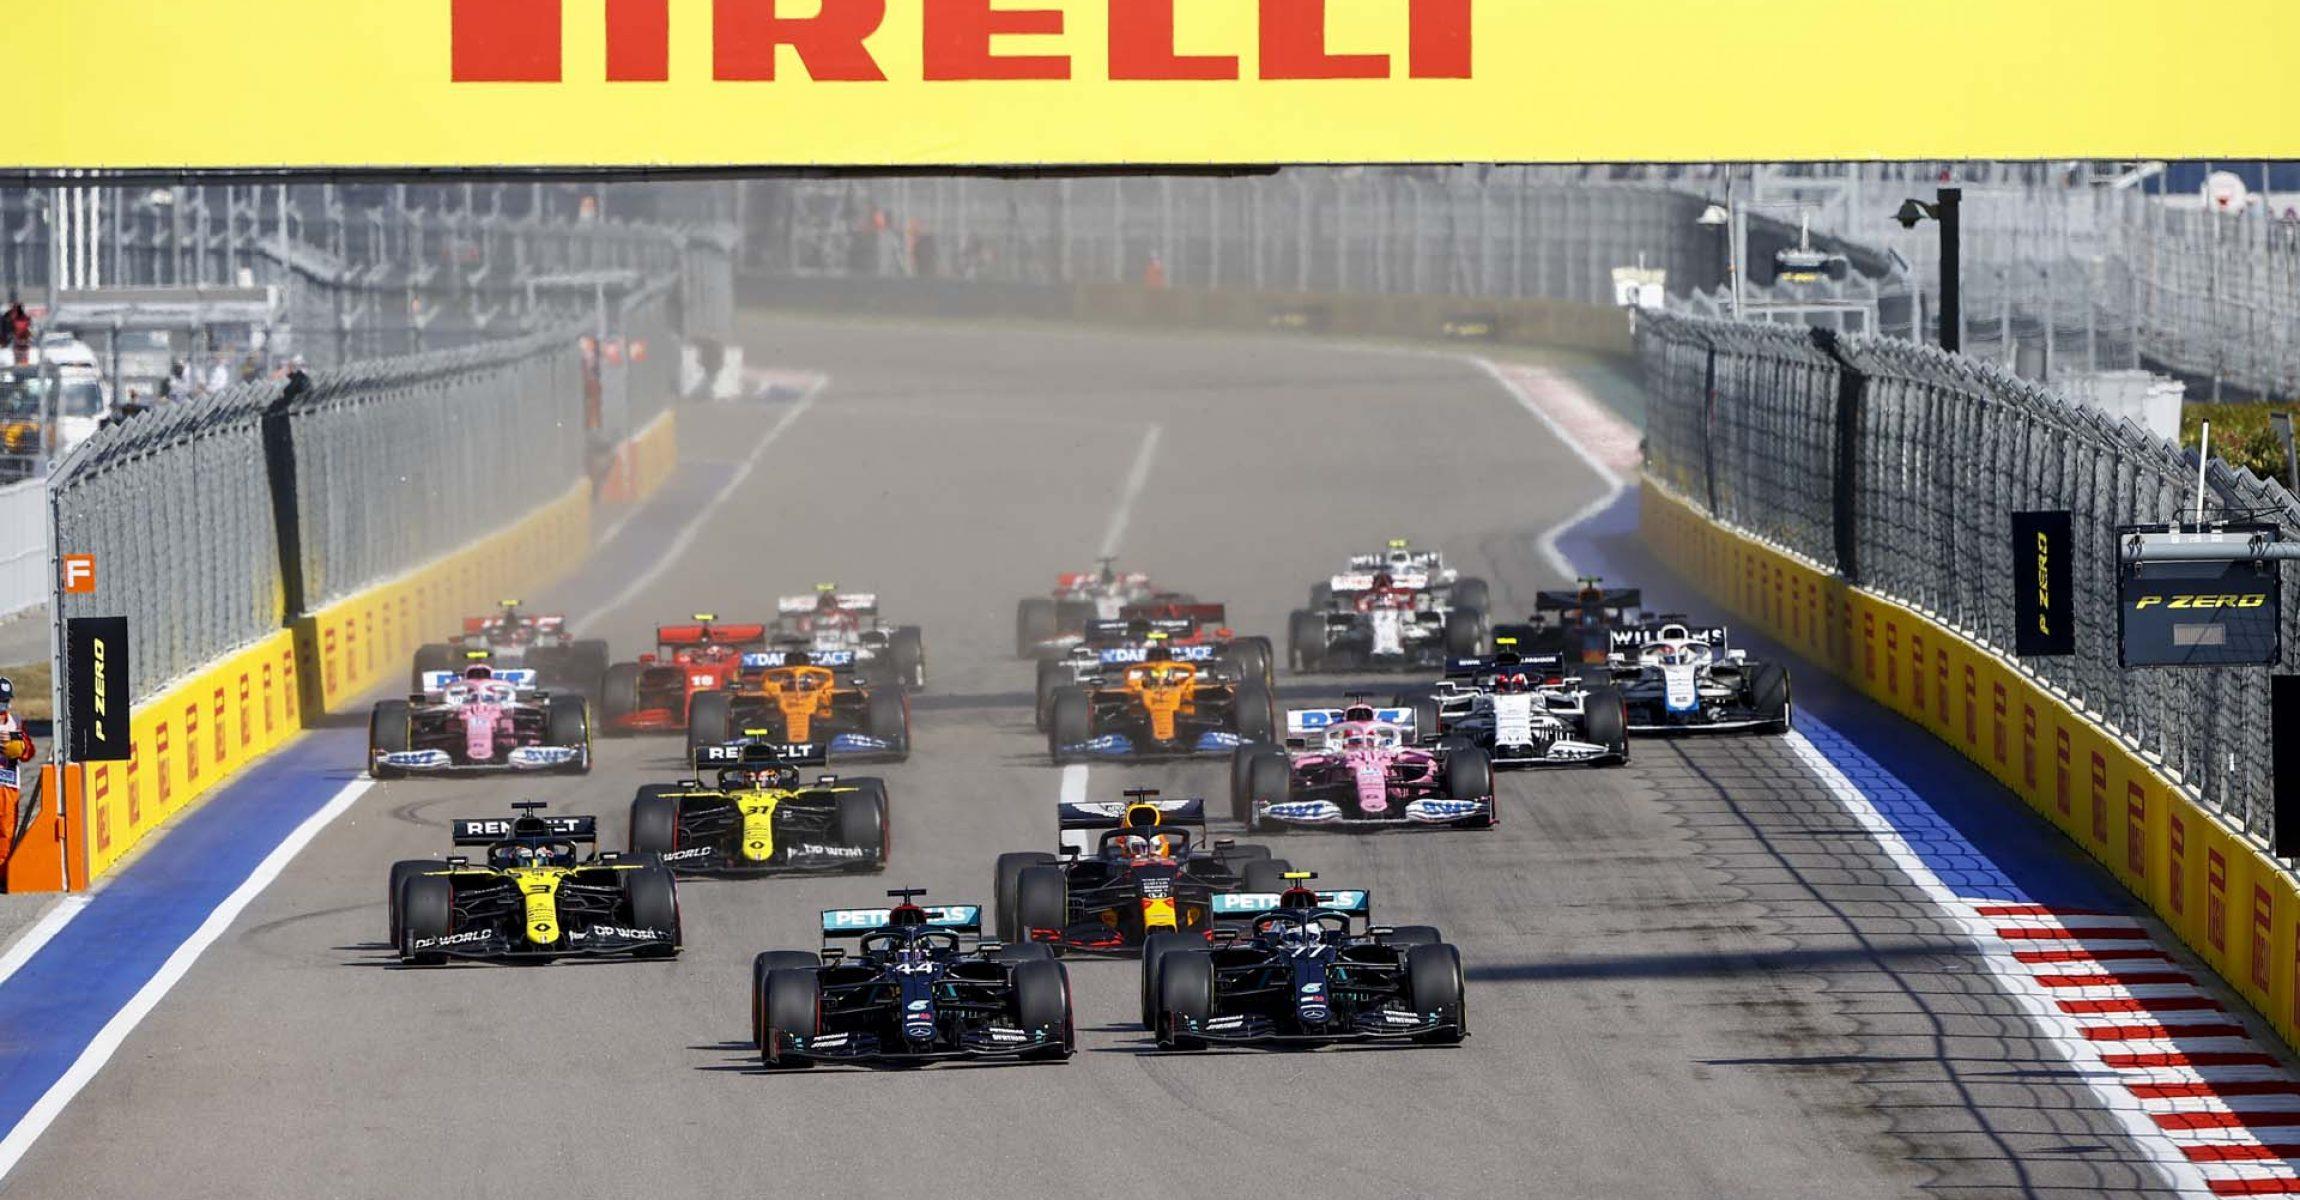 2020 Russian Grand Prix, Sunday - LAT Images Russian Grand Prix start